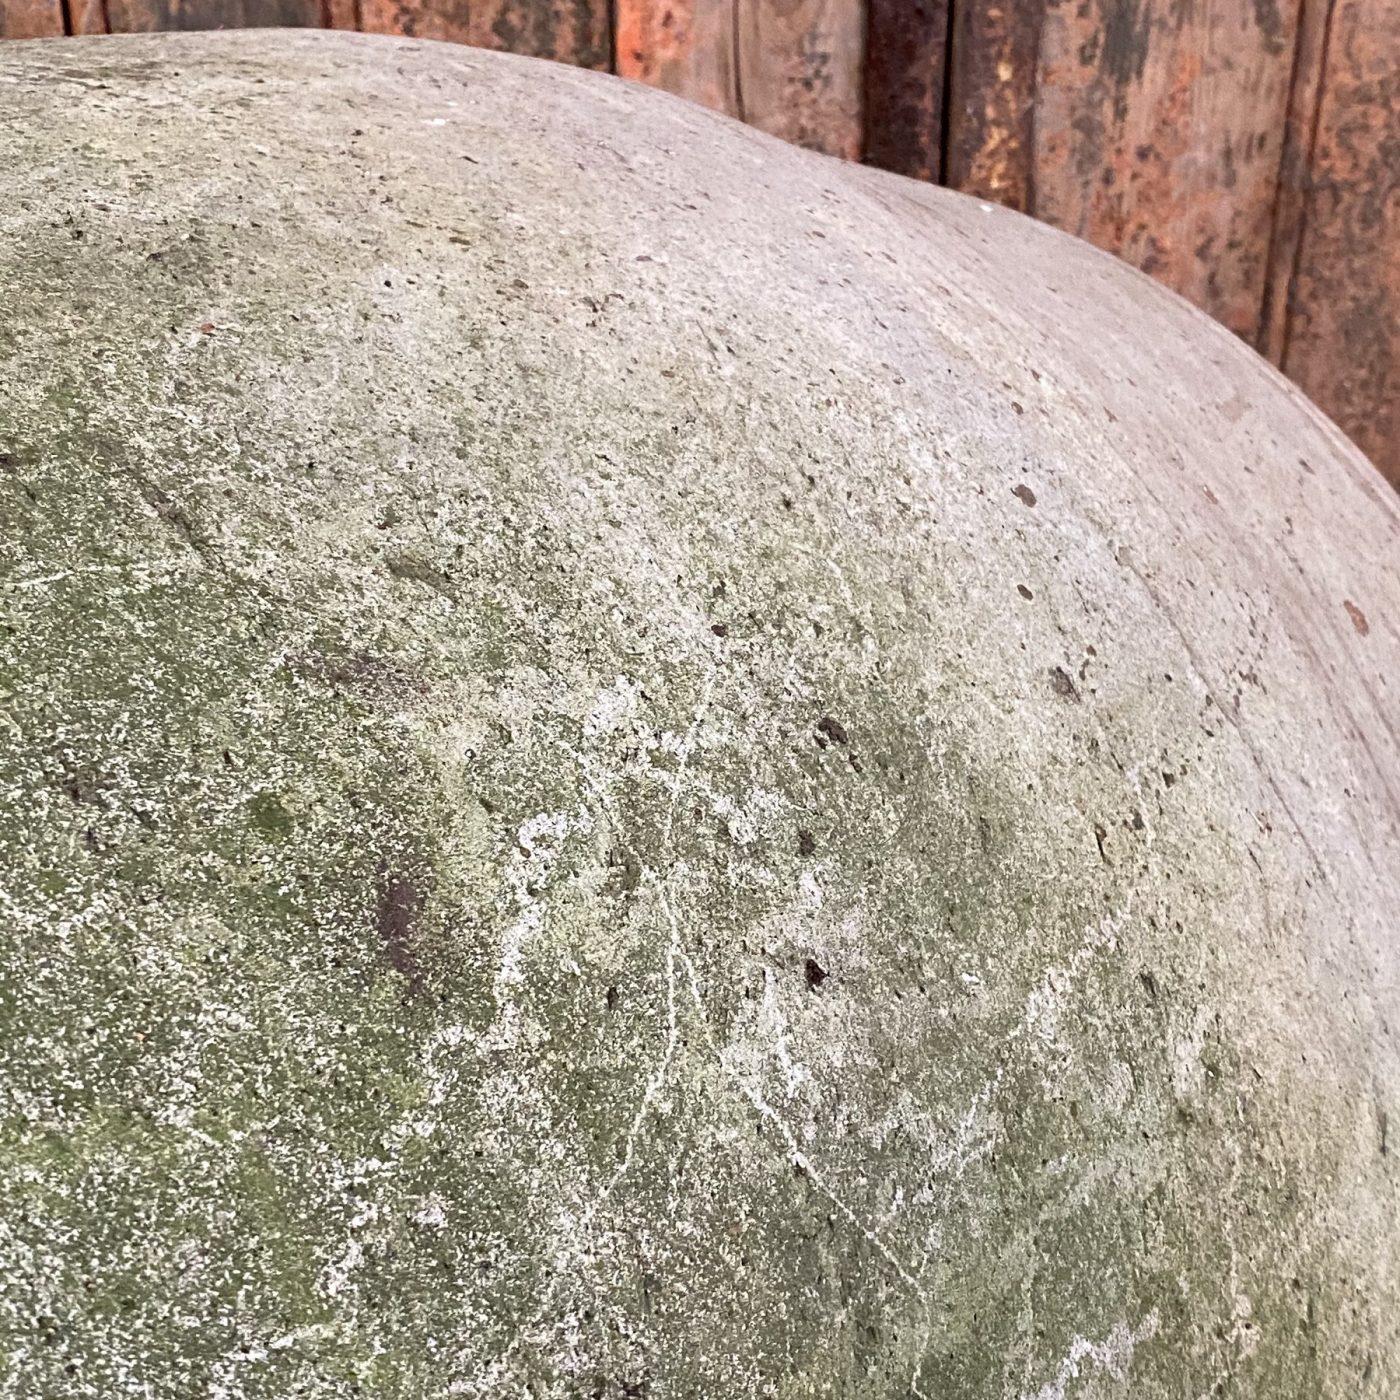 objet-vagabond-terracotta-jar0000